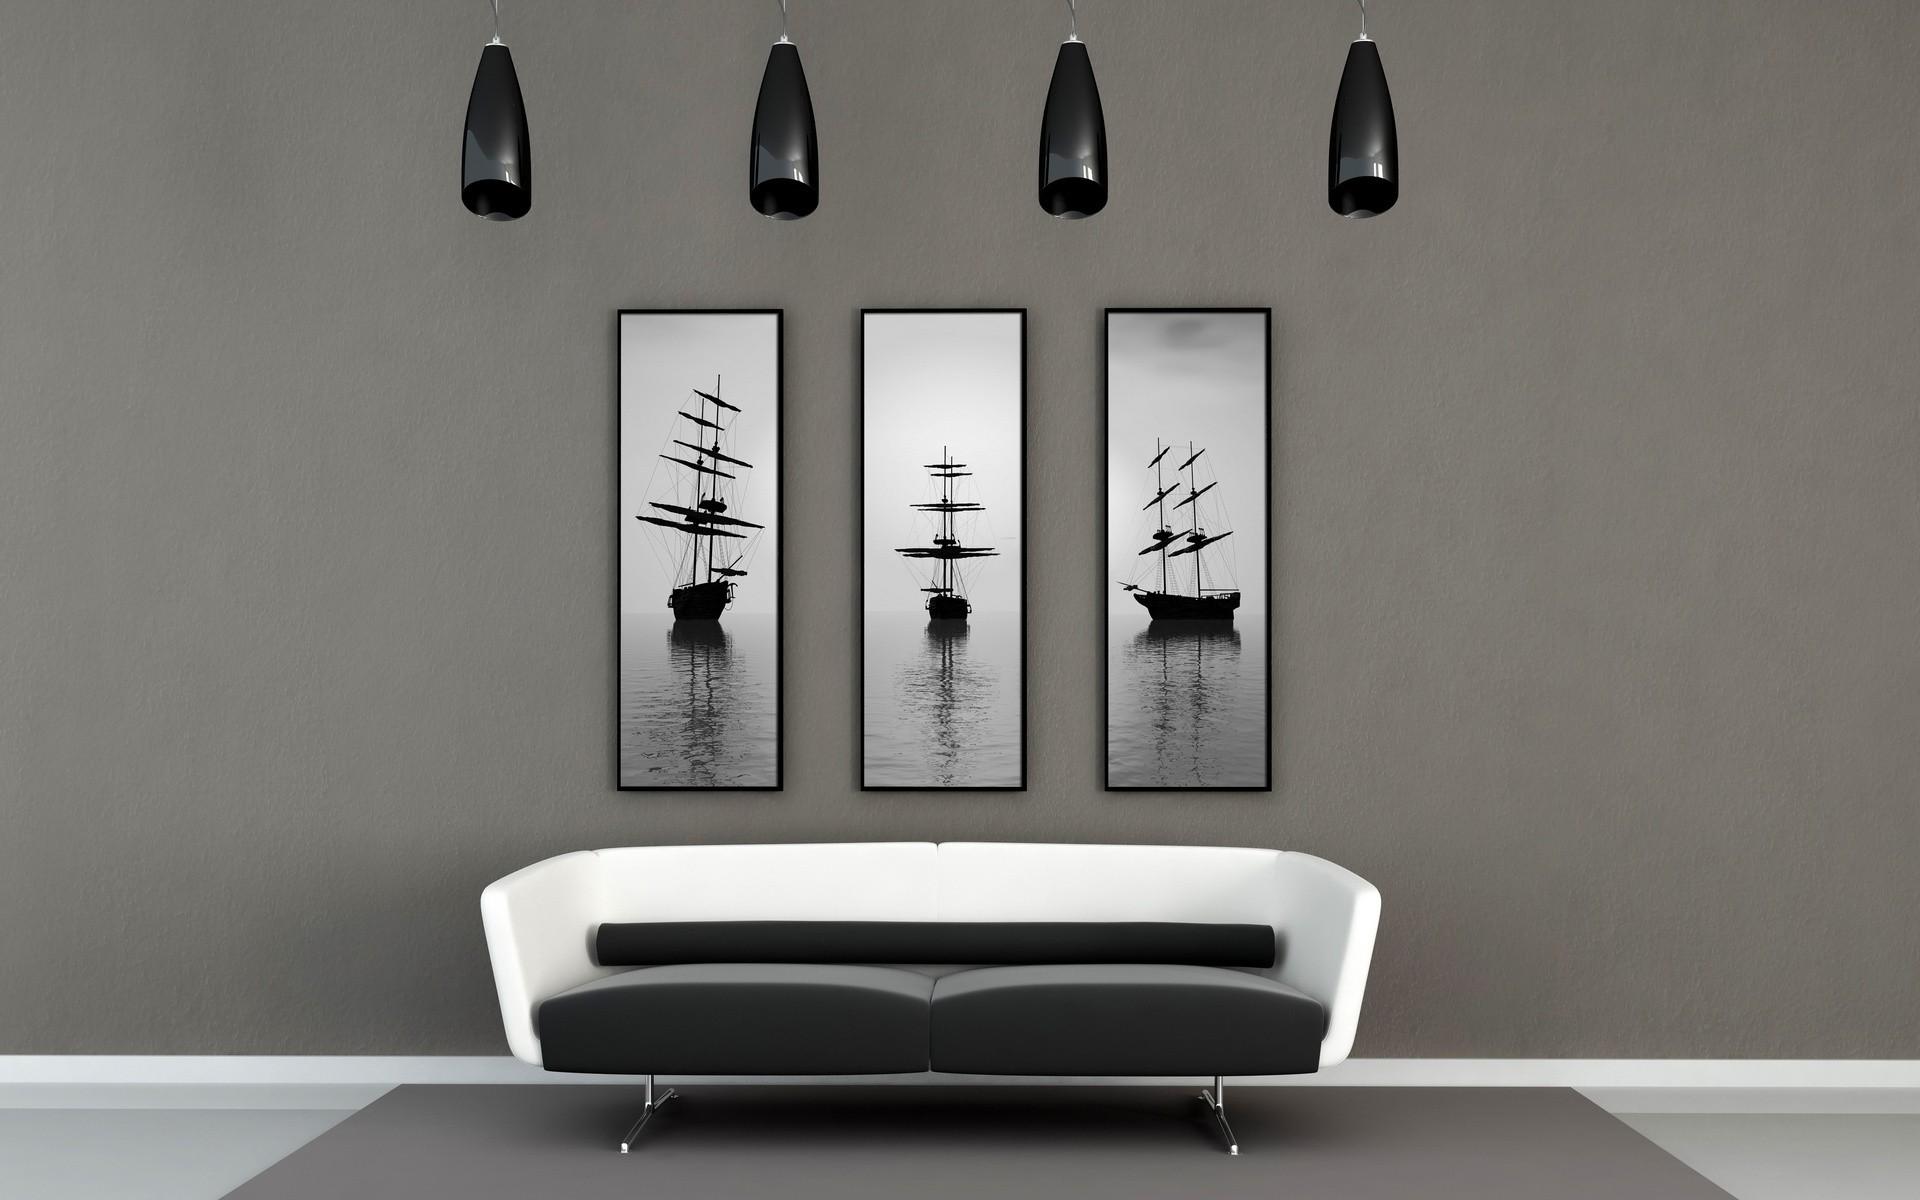 furniture computer wallpapers desktop - photo #11